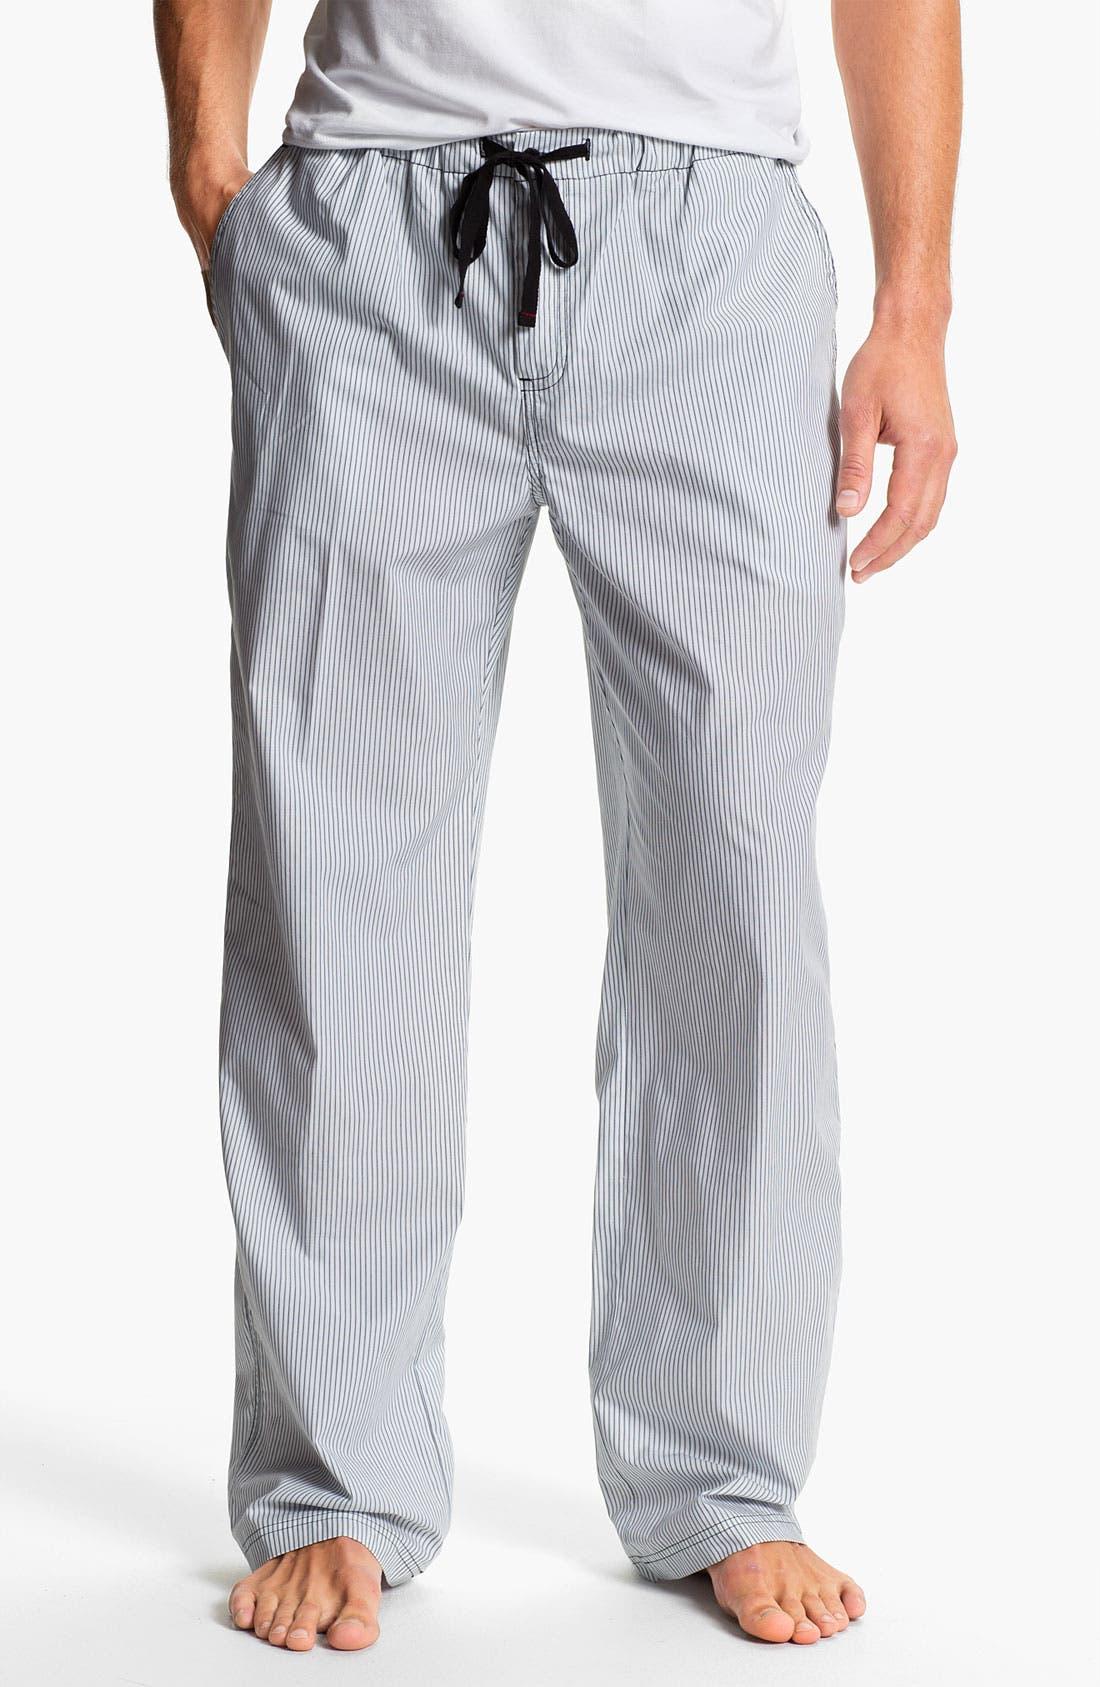 Alternate Image 1 Selected - Daniel Buchler Woven Cotton Lounge Pants